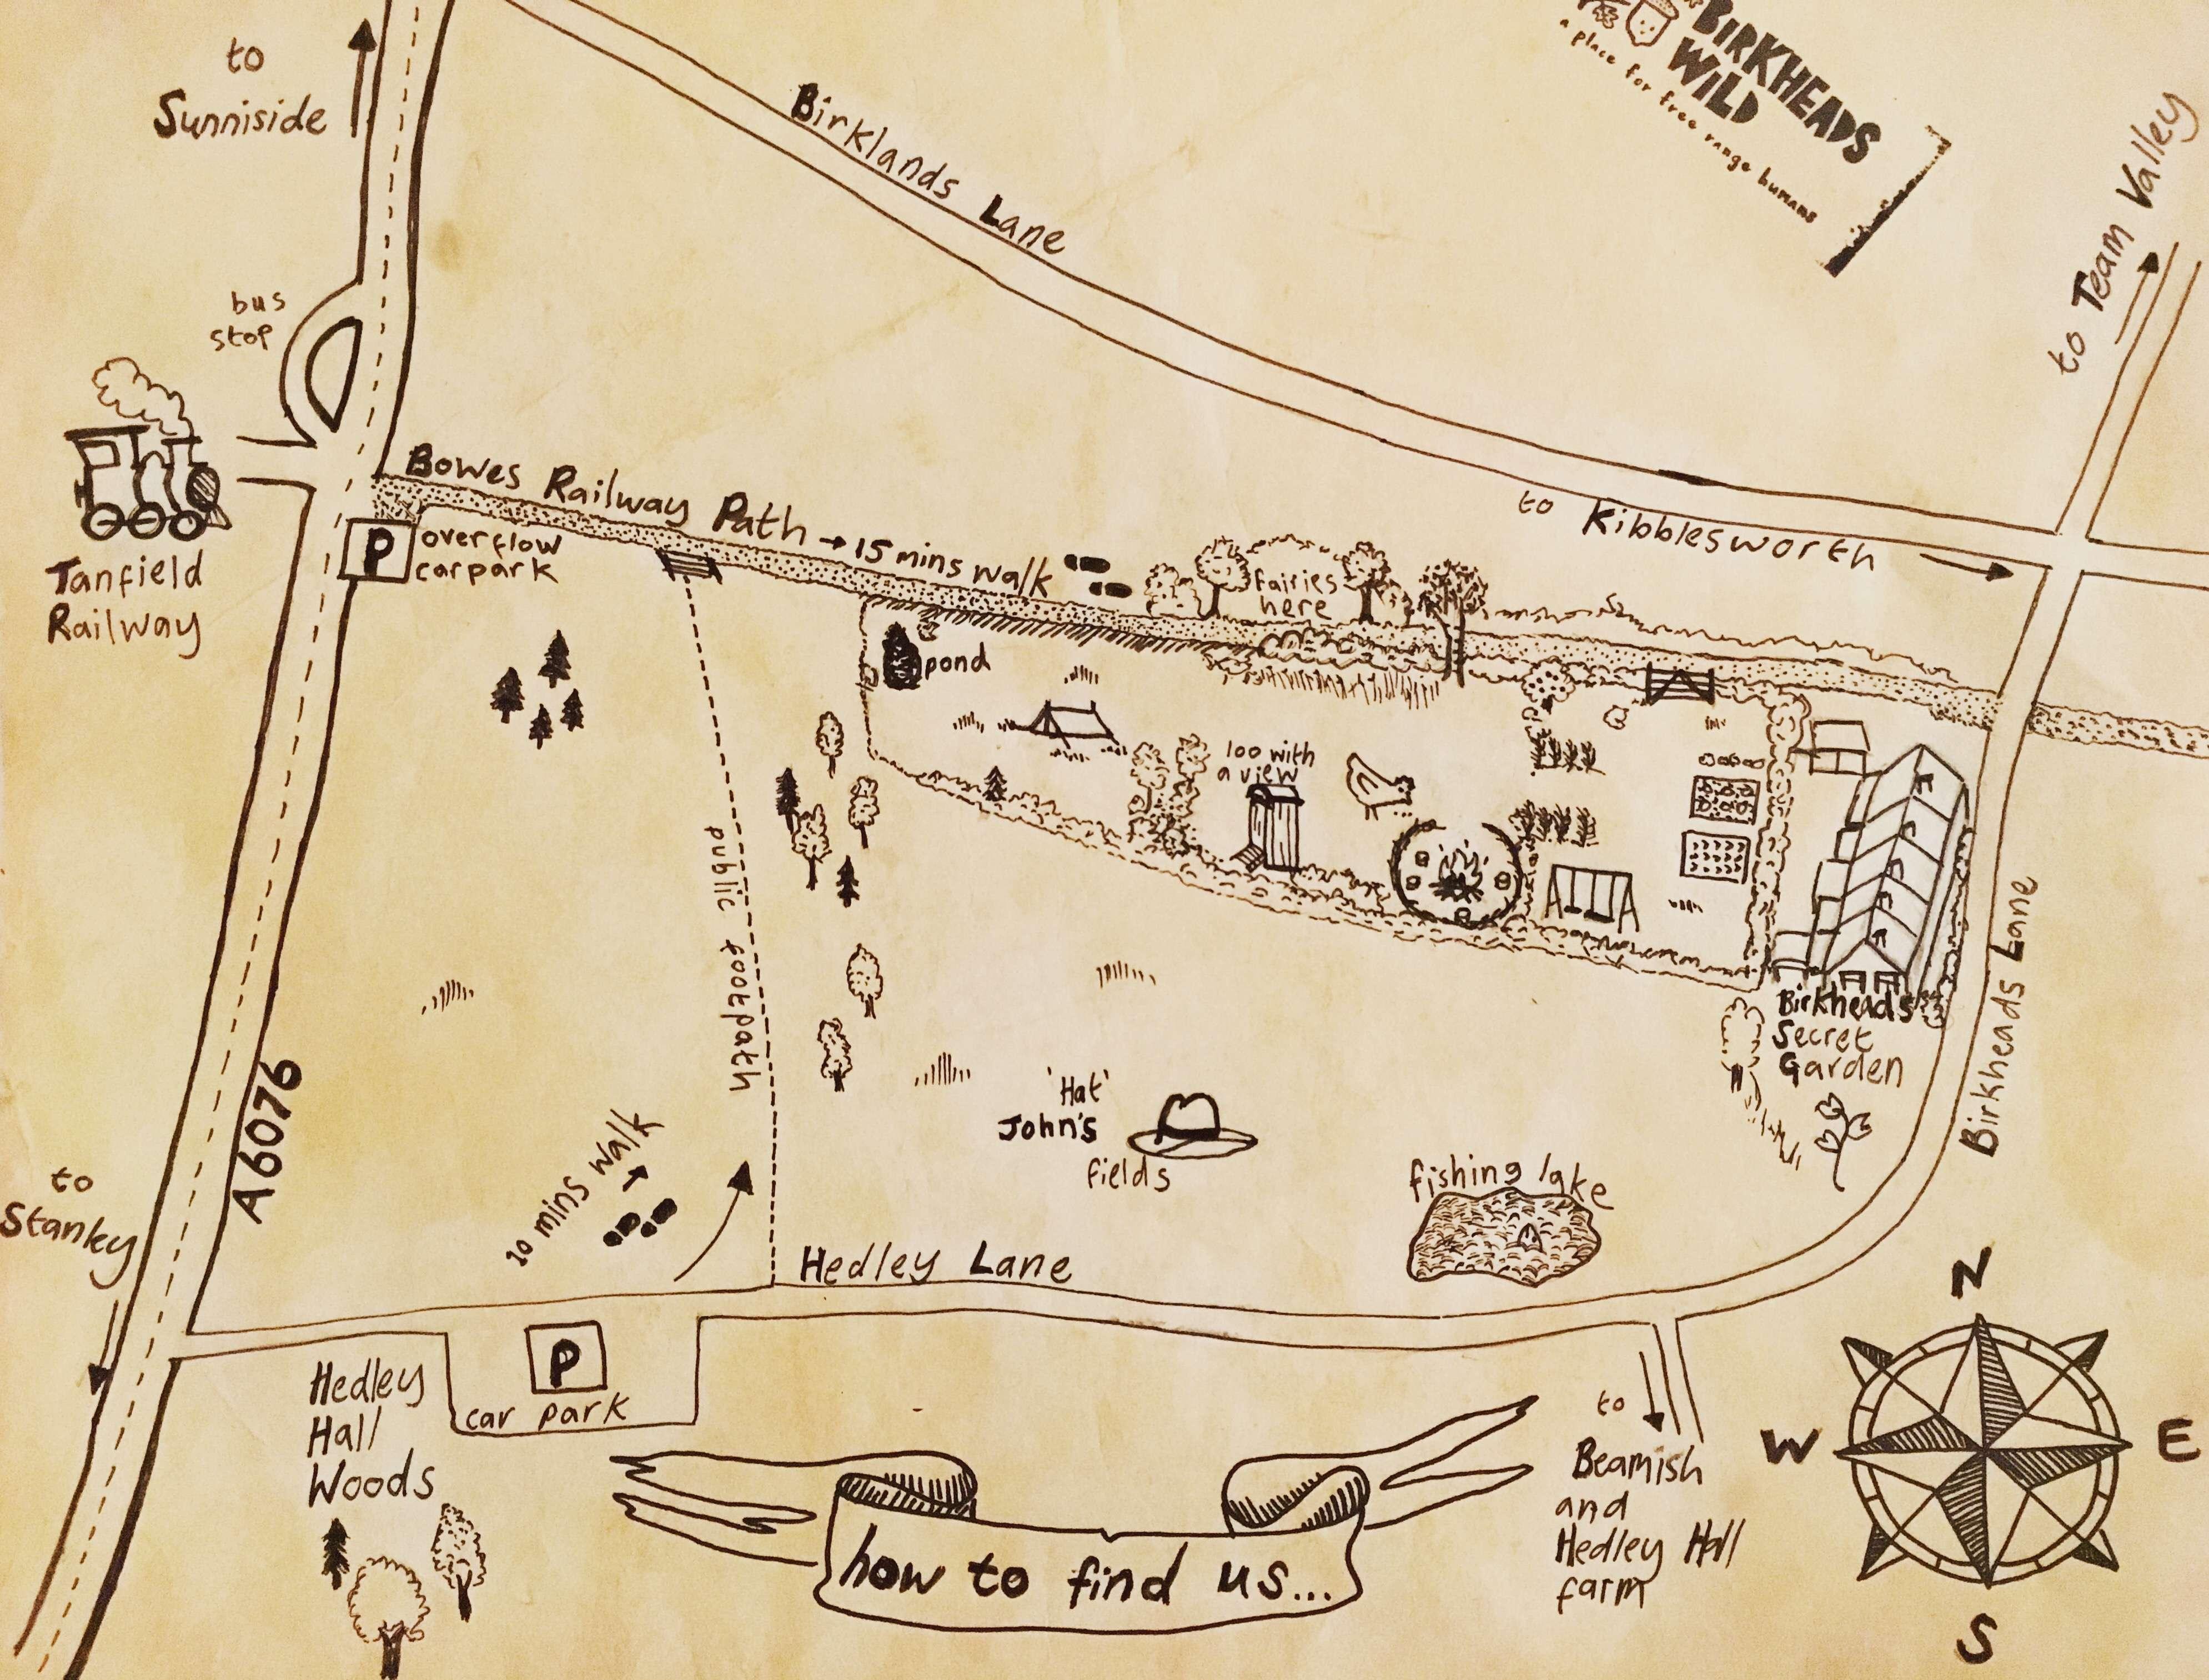 handrawn map Birkheads Wild